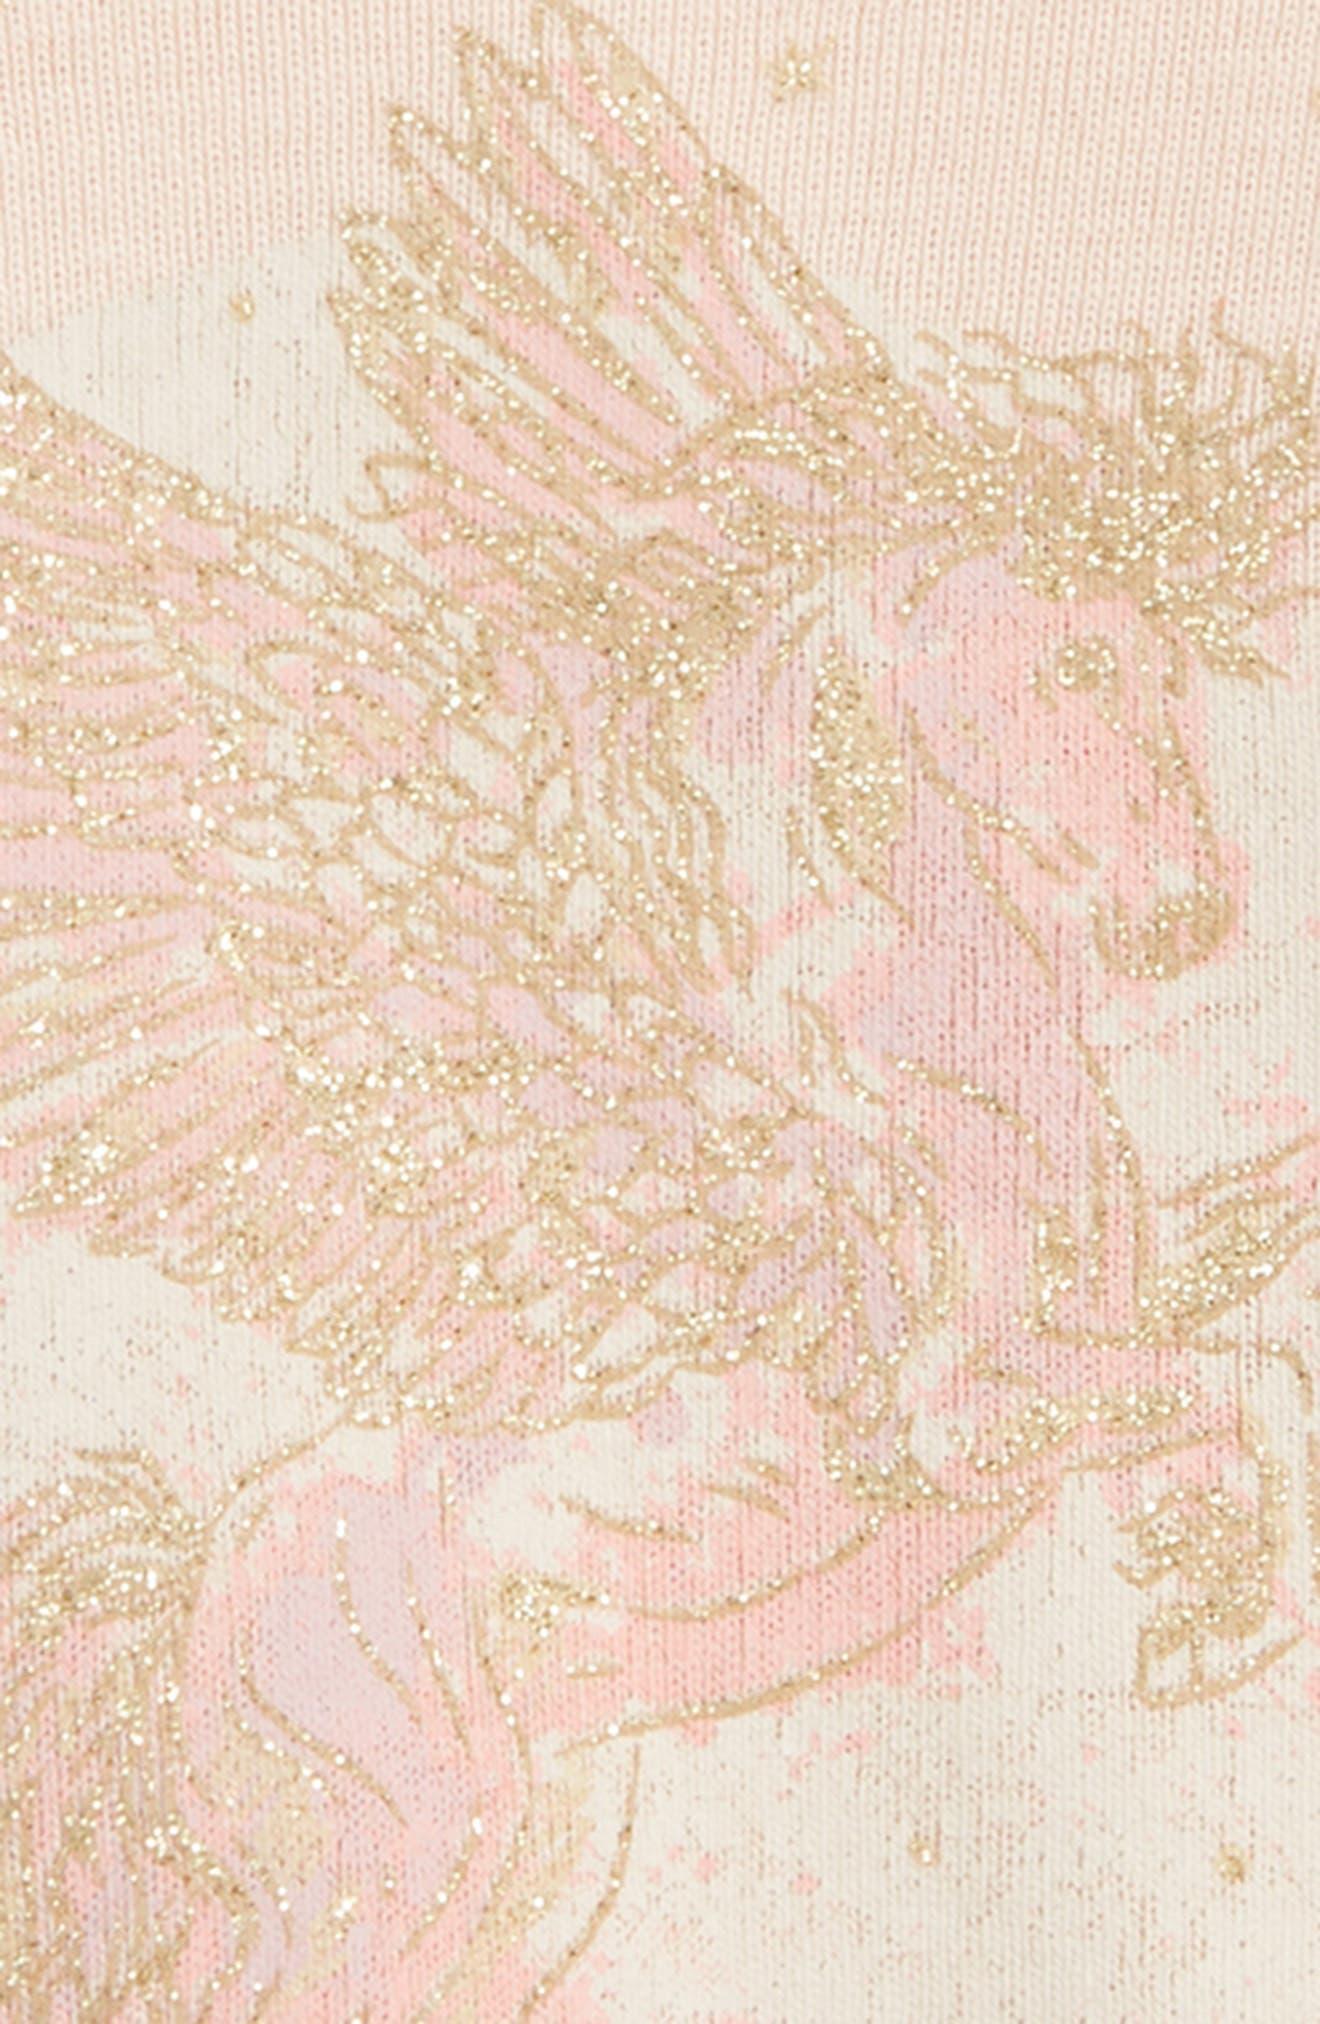 Pegasus Organic Cotton Tee,                             Alternate thumbnail 2, color,                             650